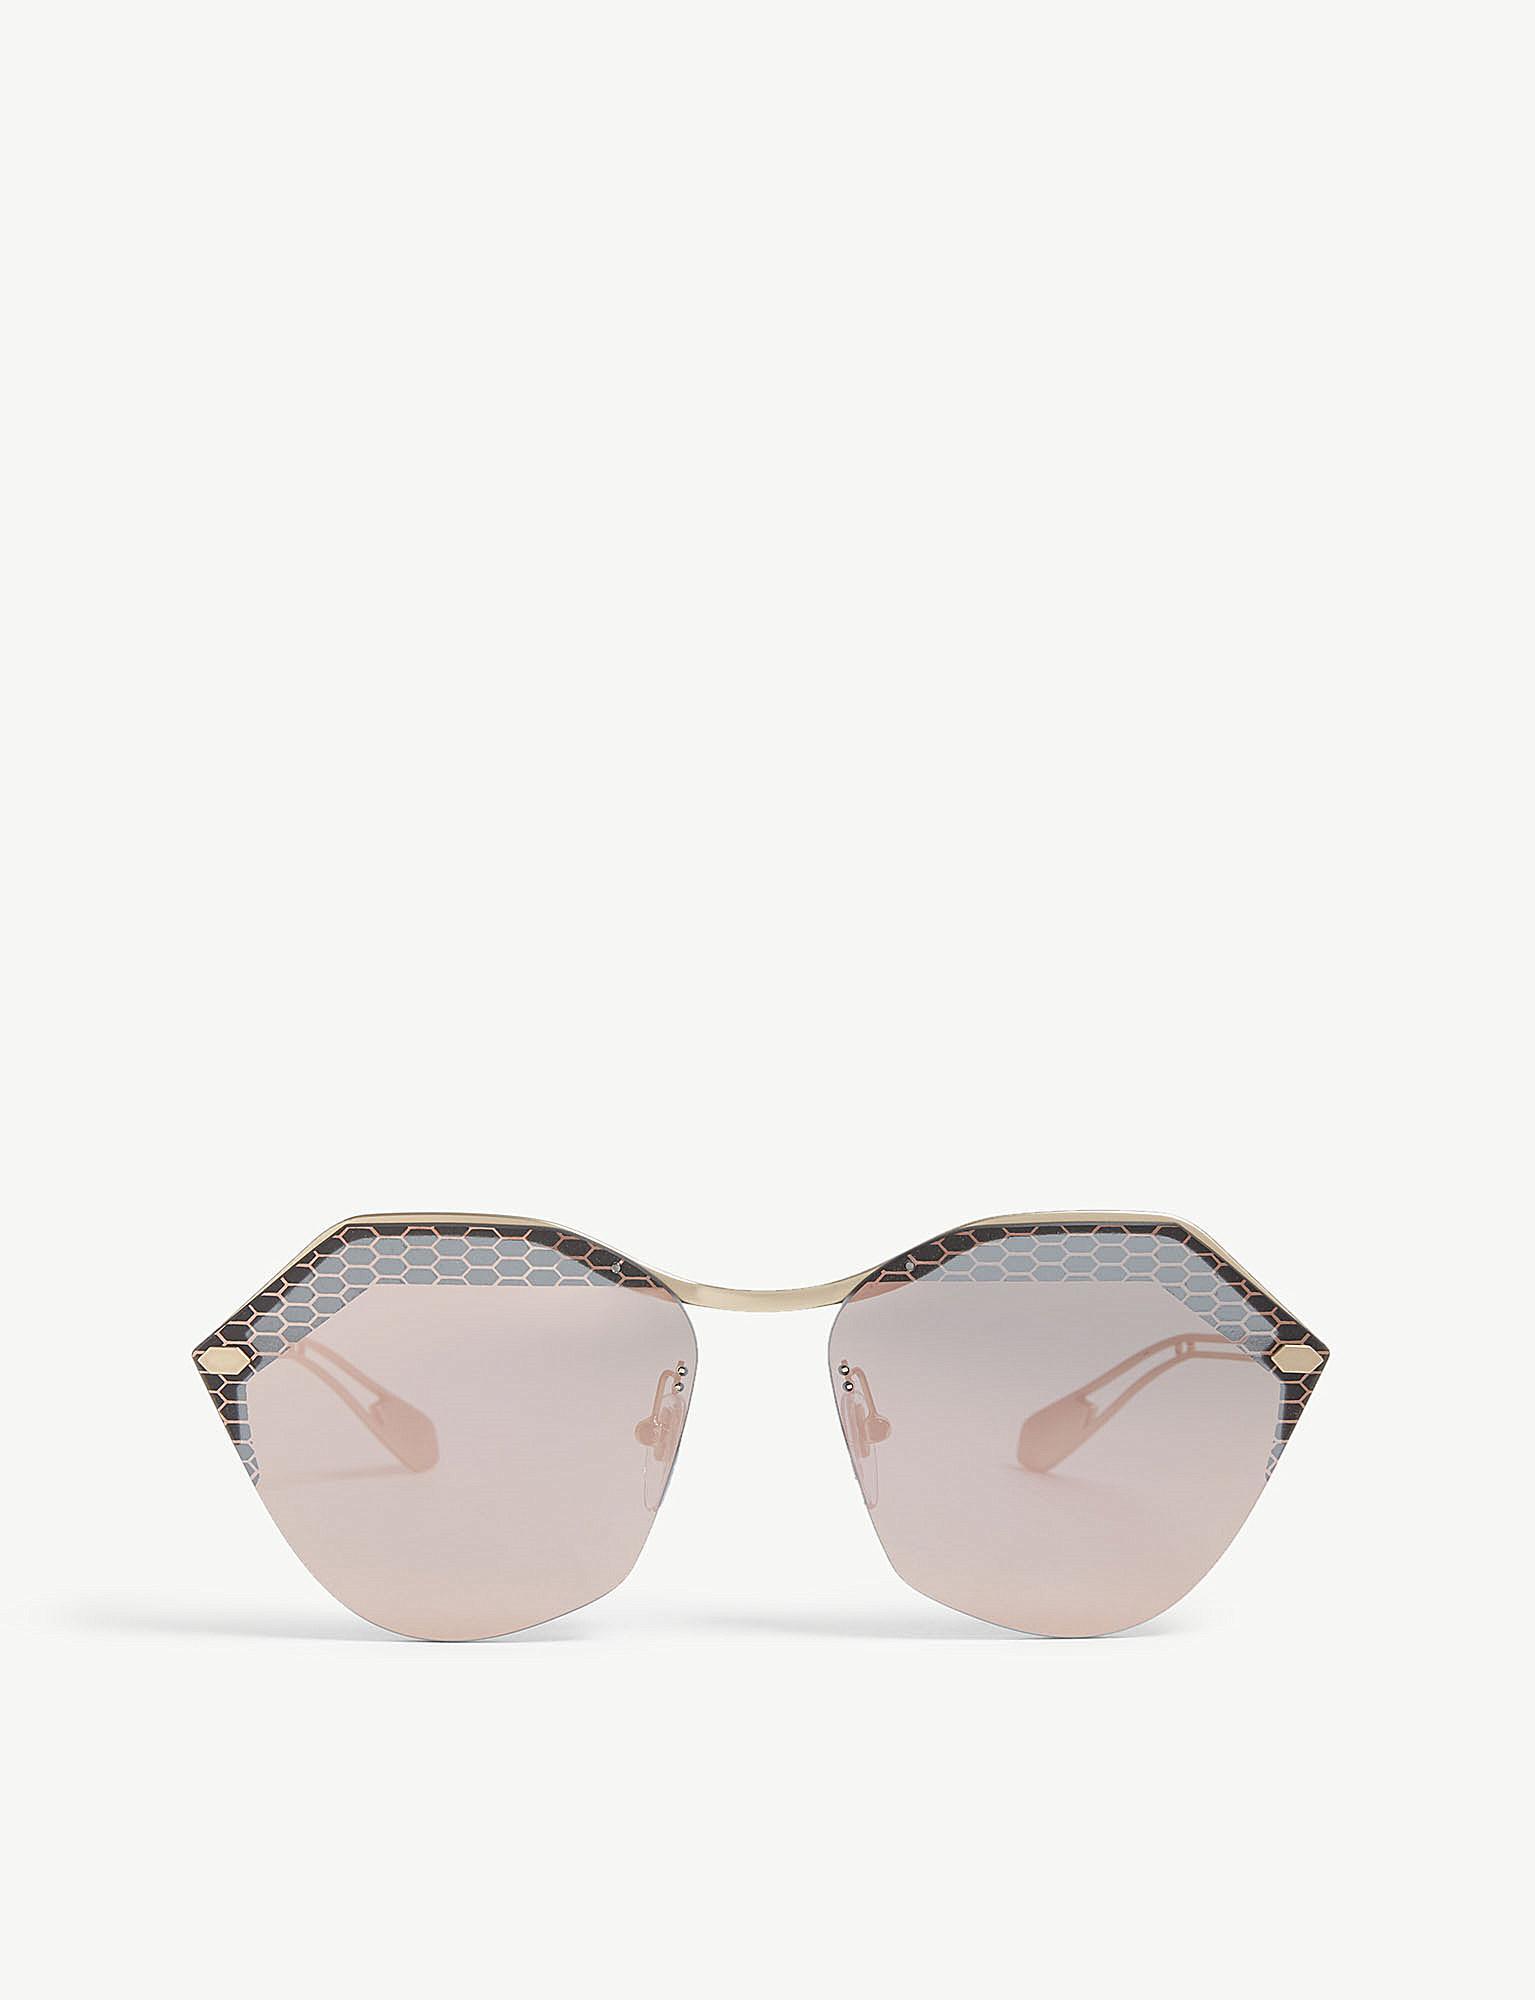 423866bf1f334 Bvlgari Bv6109 Irregular-frame Sunglasses in Metallic - Lyst